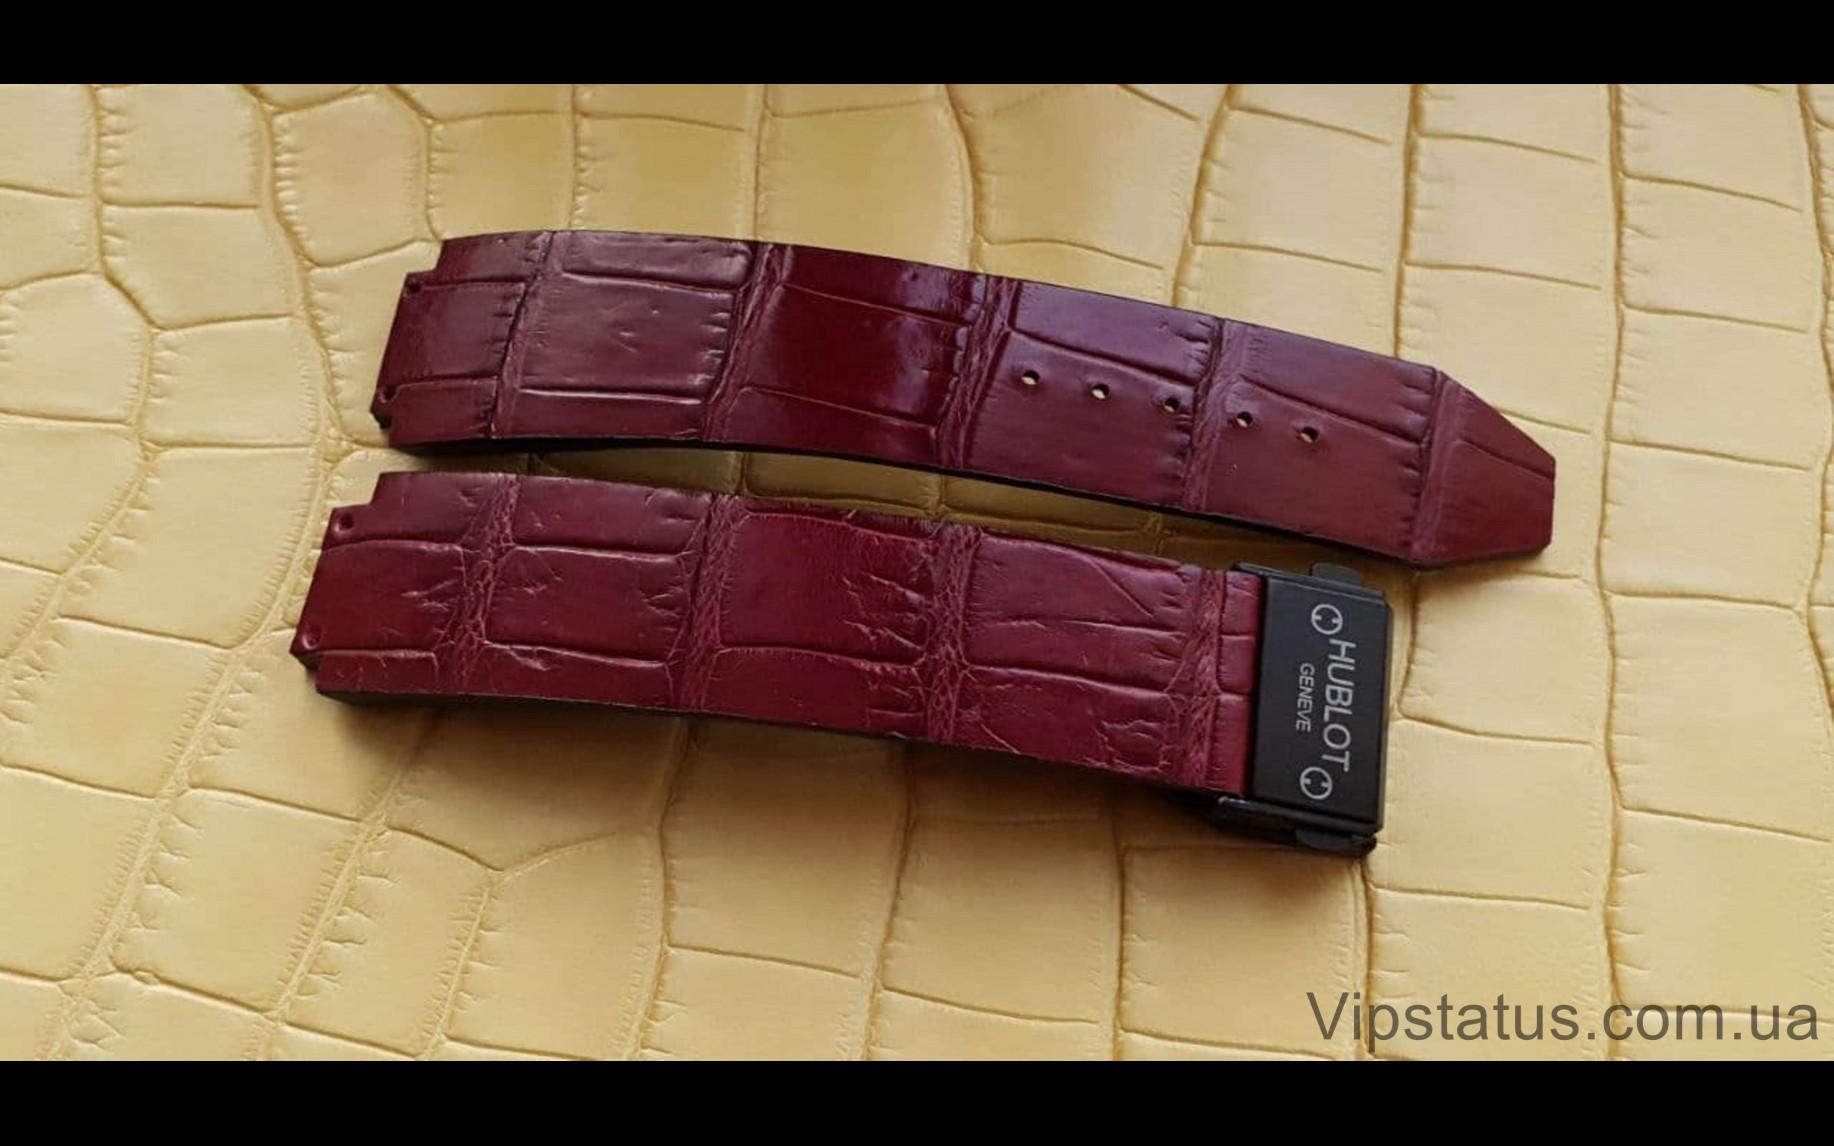 Elite Премиум ремешок для часов Hublot кожа крокодила Premium Crocodile Strap for Hublot watches image 2